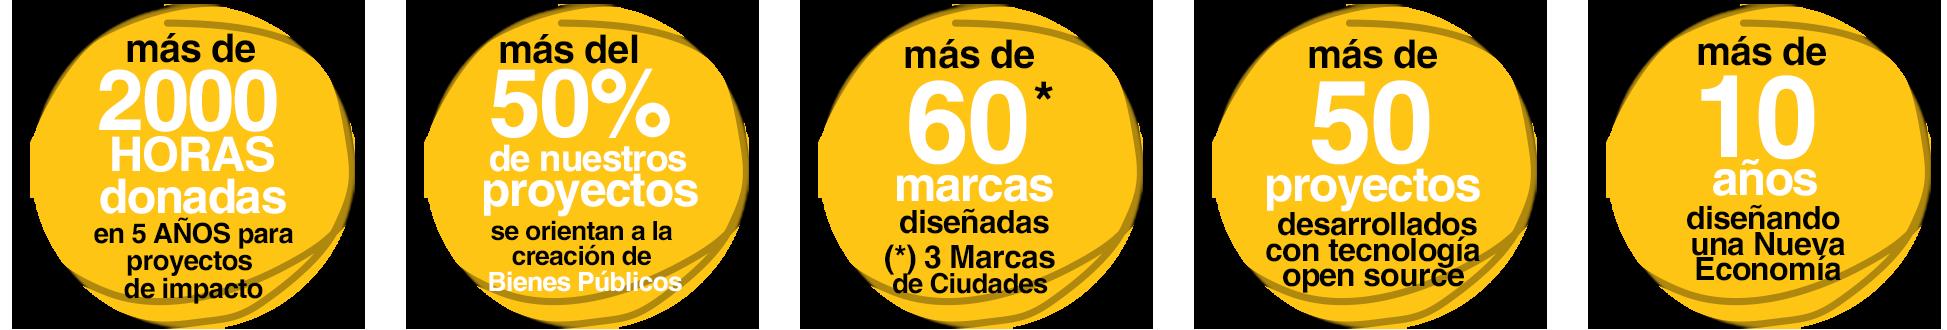 metricas2020-3v